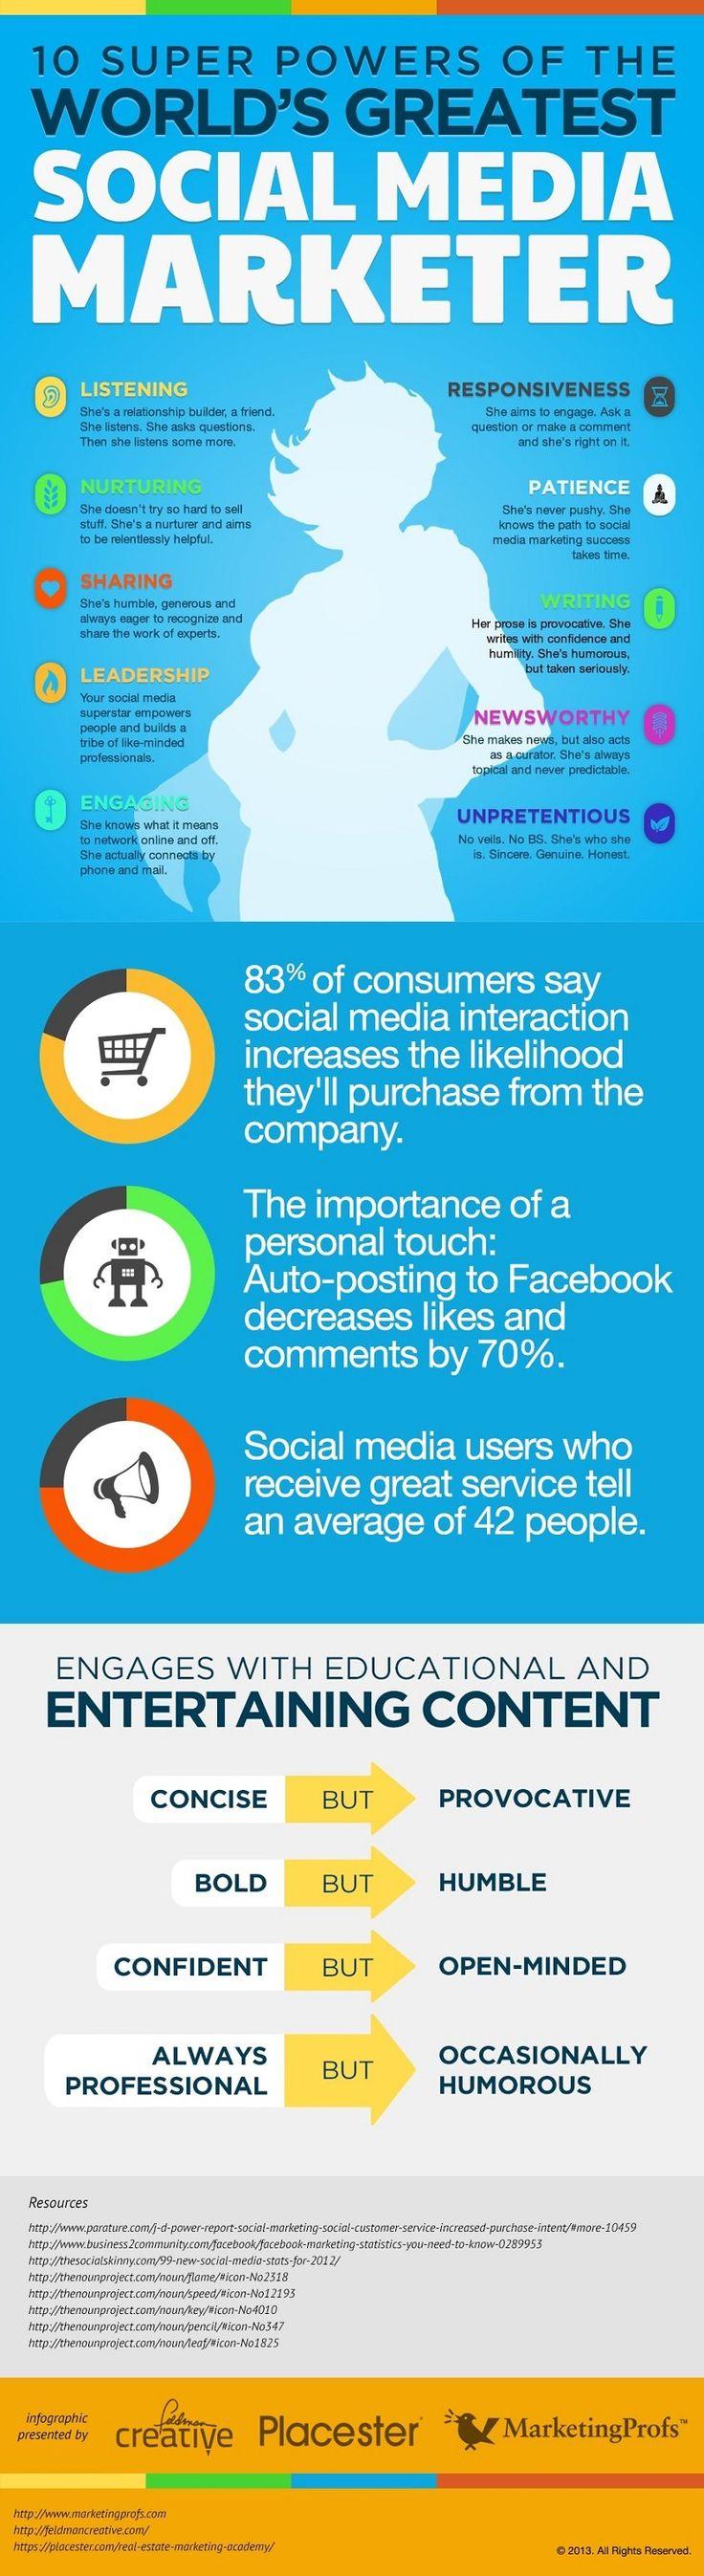 10 Super Powers of the World's Greatest Social Media Marketer #socialmedia #digitalmarketing #infographic